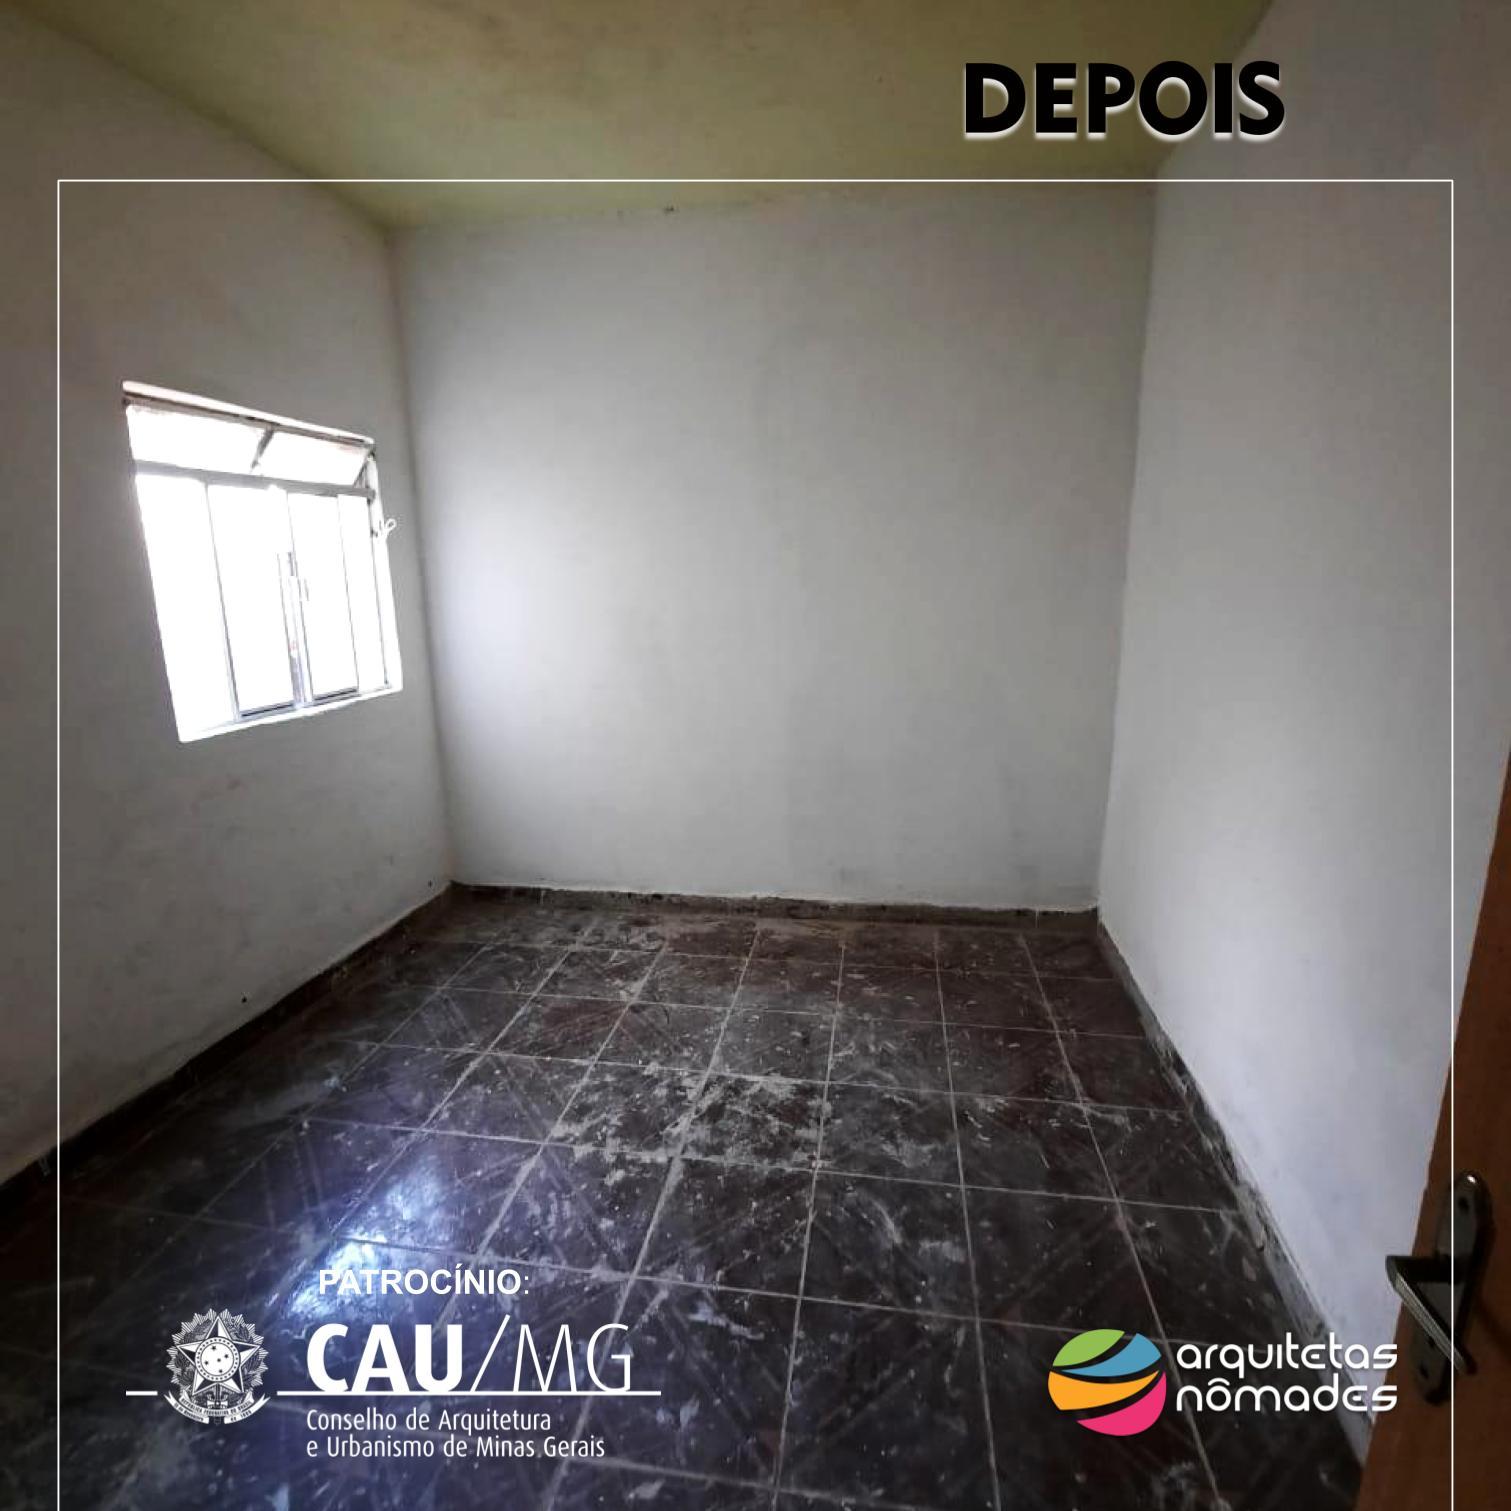 DEPOIS2-sandra